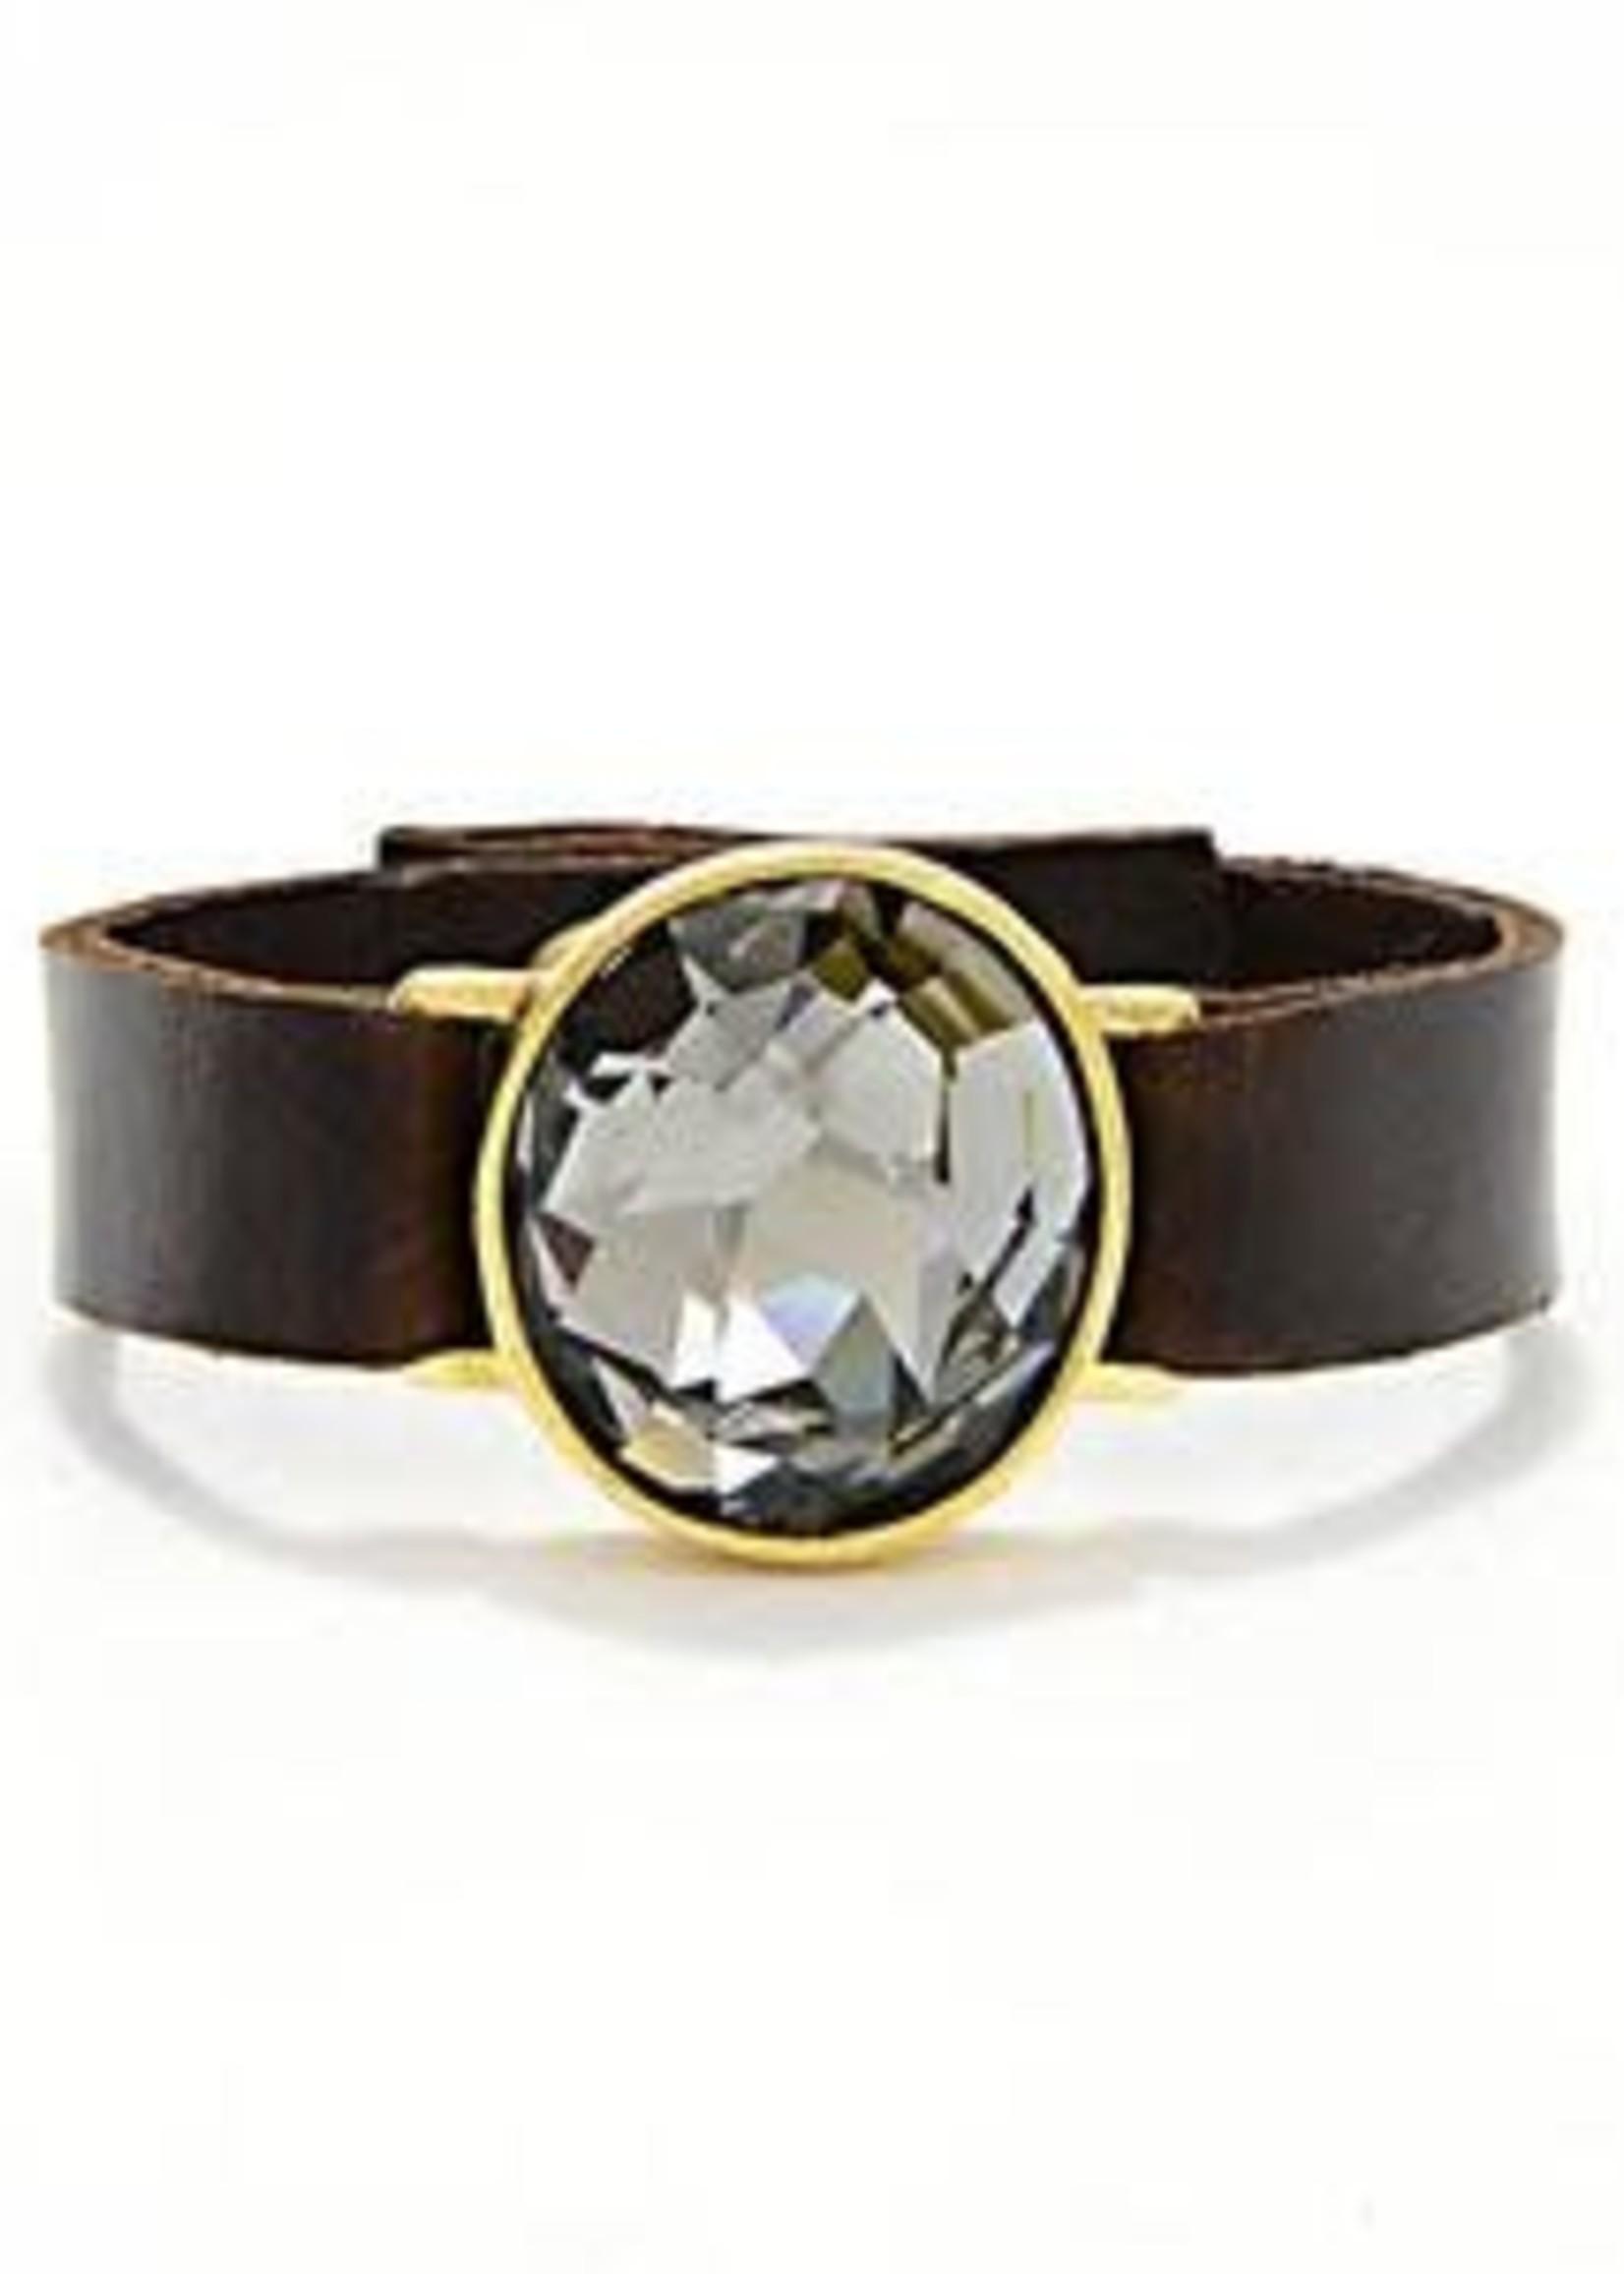 Rebel Designs Rebel - Gold Plate w/Black Diamond Bracelet (RR1014)